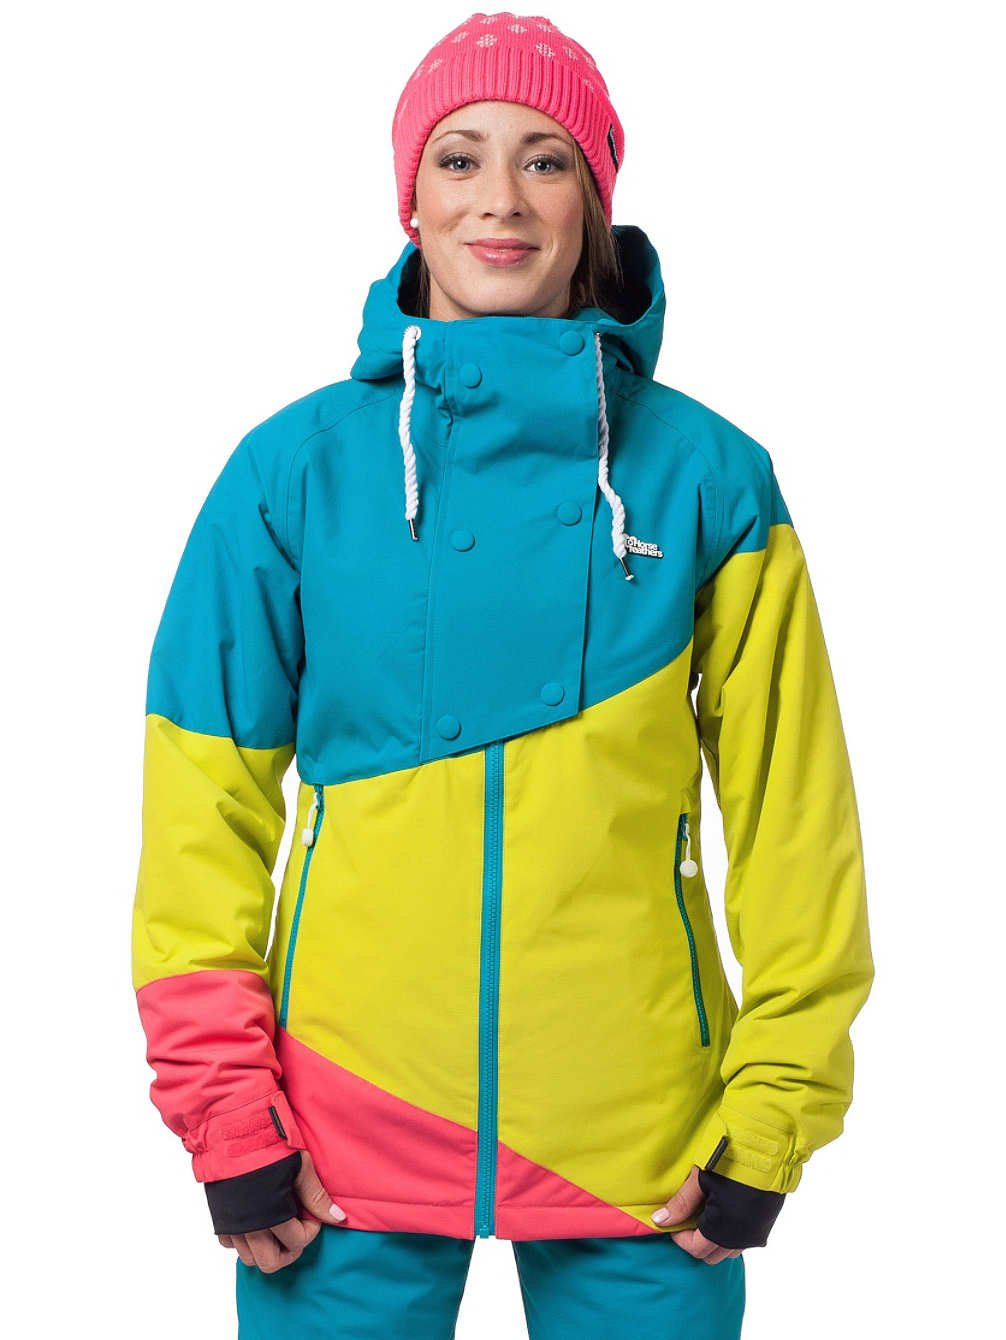 Damen Snowboard Jacke Horsefeathers Momo Jacket bestellen